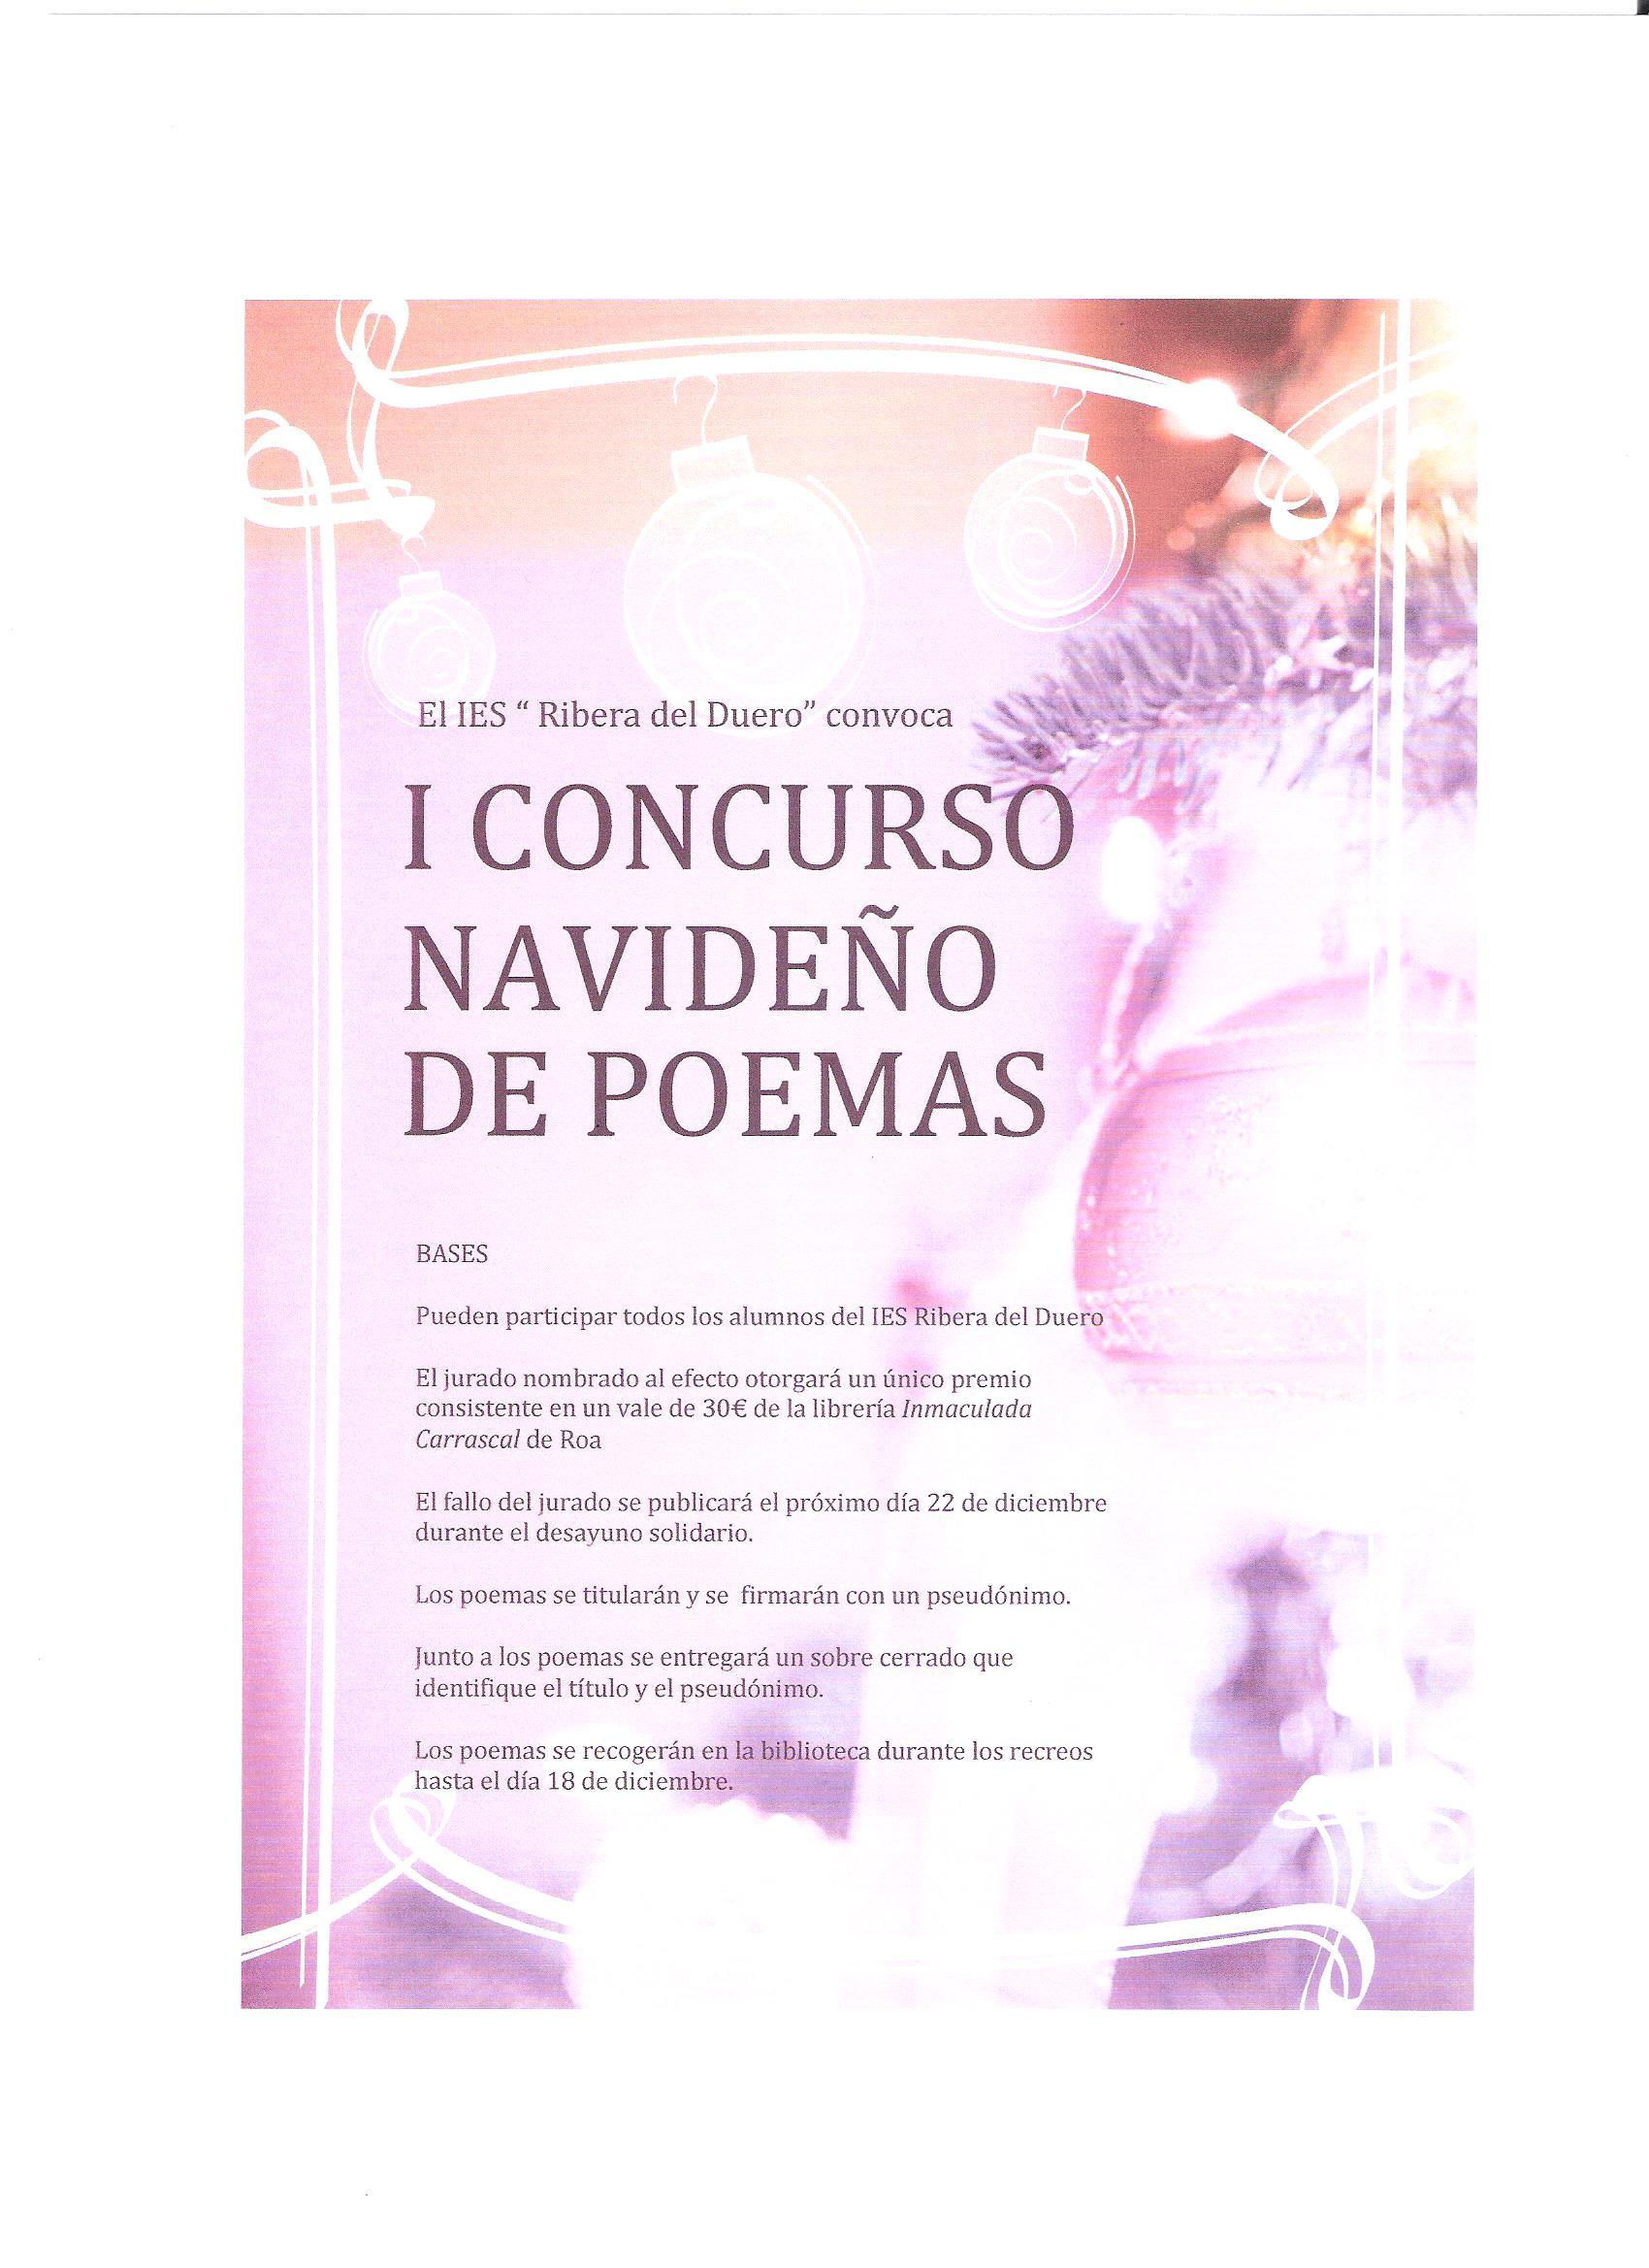 I CONCURSO NAVIDEÑO DE POEMAS